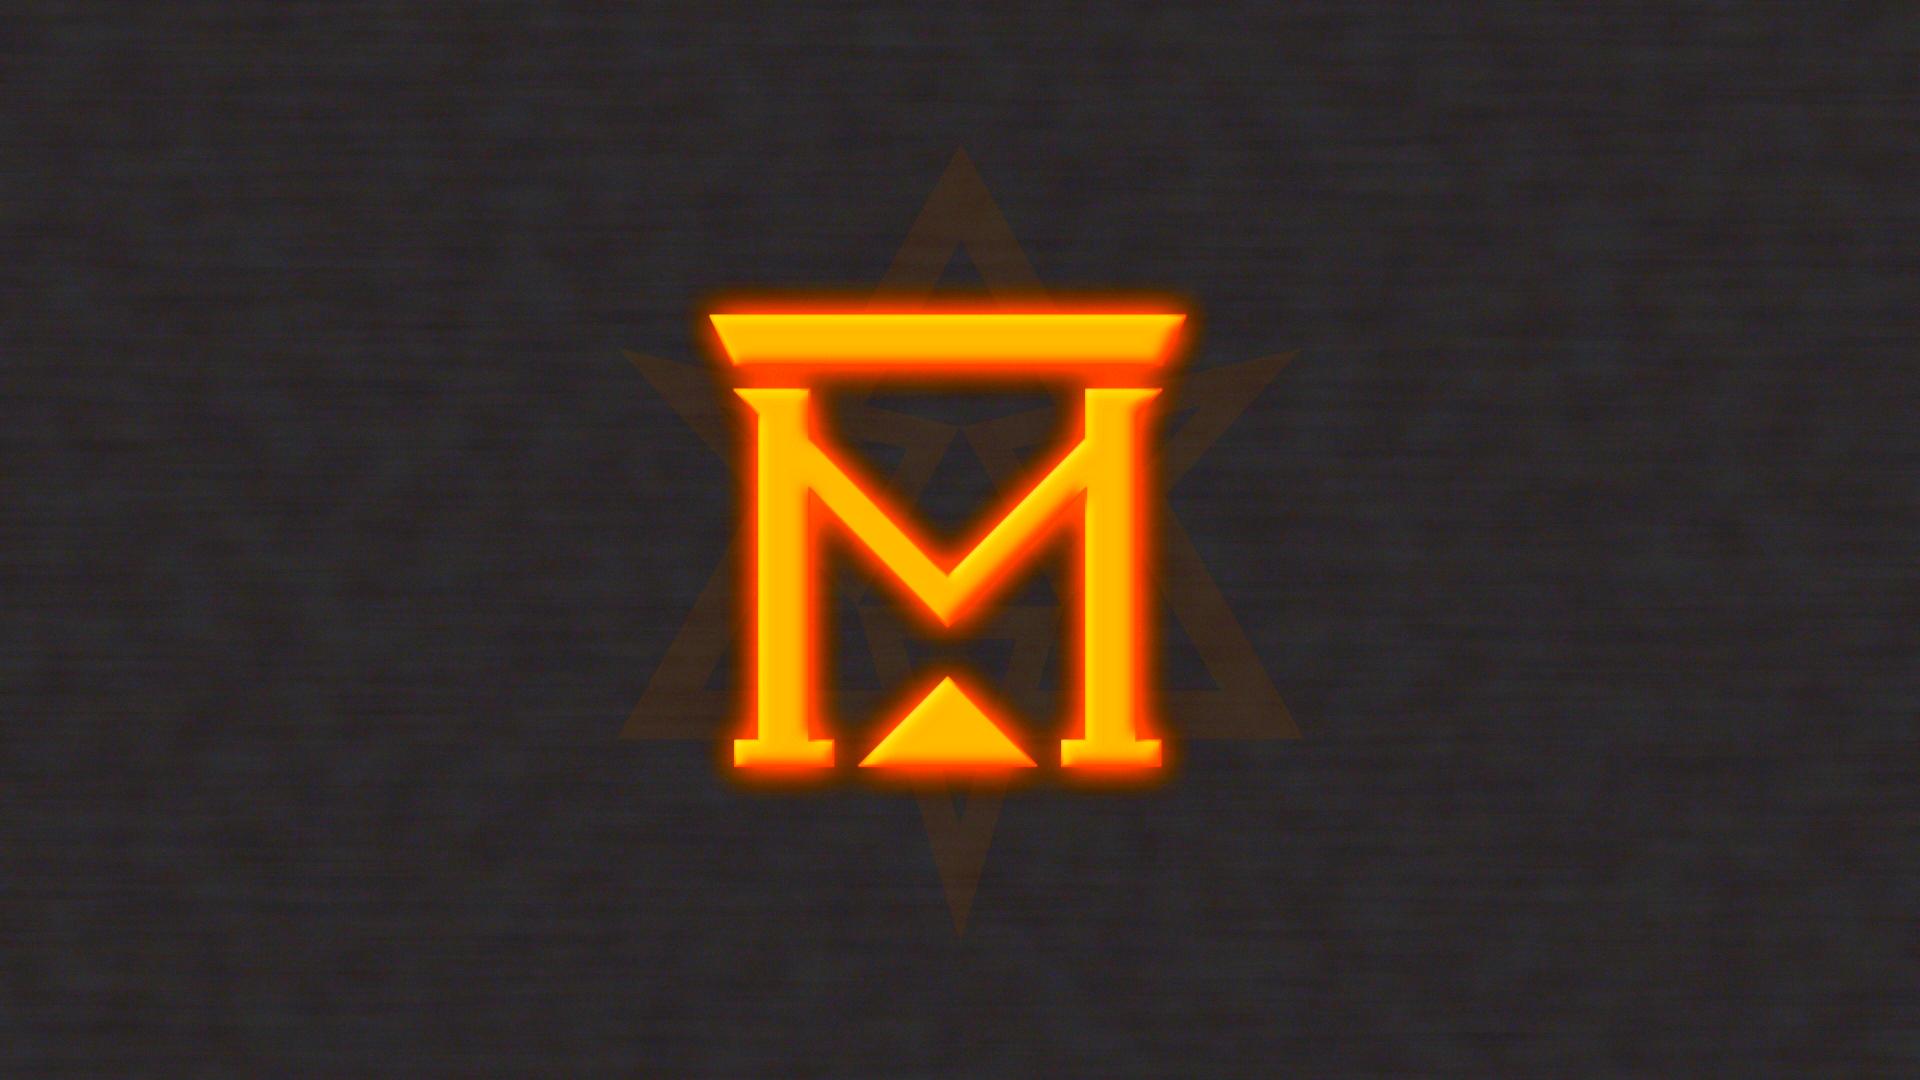 Icon for I love money